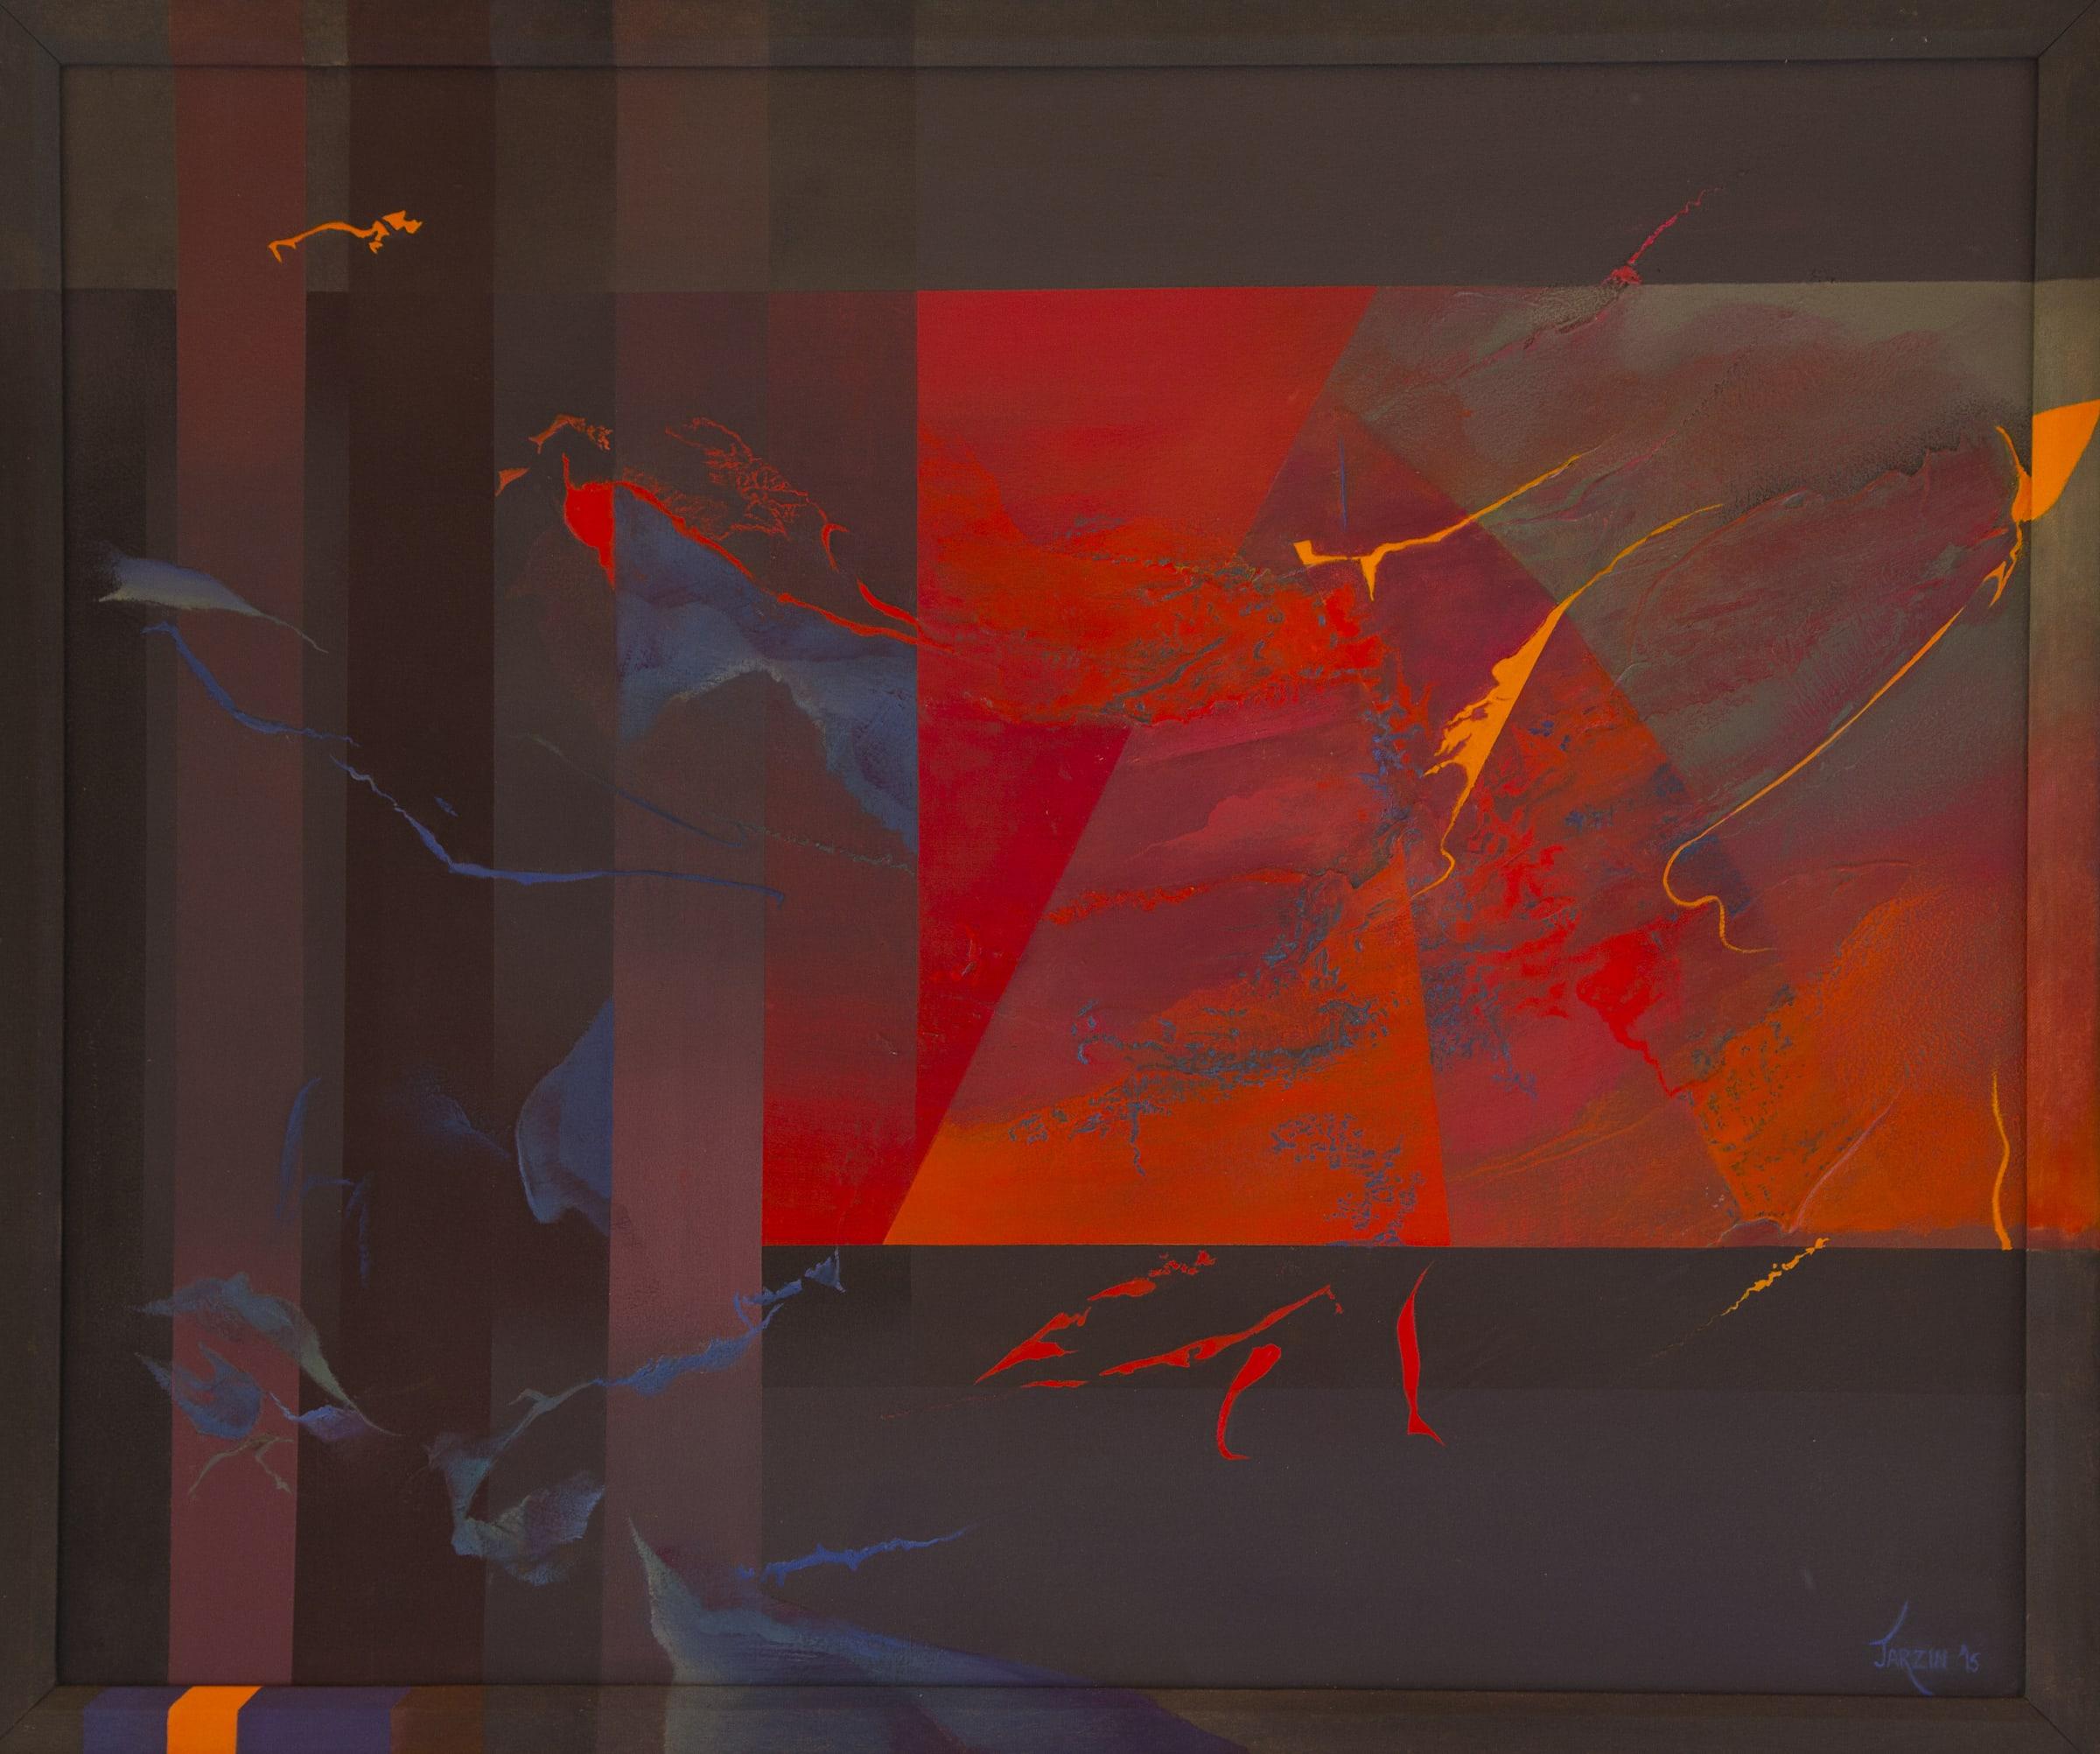 <span class=&#34;link fancybox-details-link&#34;><a href=&#34;/artworks/categories/120/3079-sheila-jarzin-fragmentation-2015/&#34;>View Detail Page</a></span><div class=&#34;artist&#34;><strong>Sheila Jarzin</strong></div> <div class=&#34;title&#34;><em>Fragmentation</em>, 2015</div> <div class=&#34;medium&#34;>Oil on Canvas</div> <div class=&#34;dimensions&#34;>81cm x 96cm</div><div class=&#34;price&#34;>R11,200.00</div>